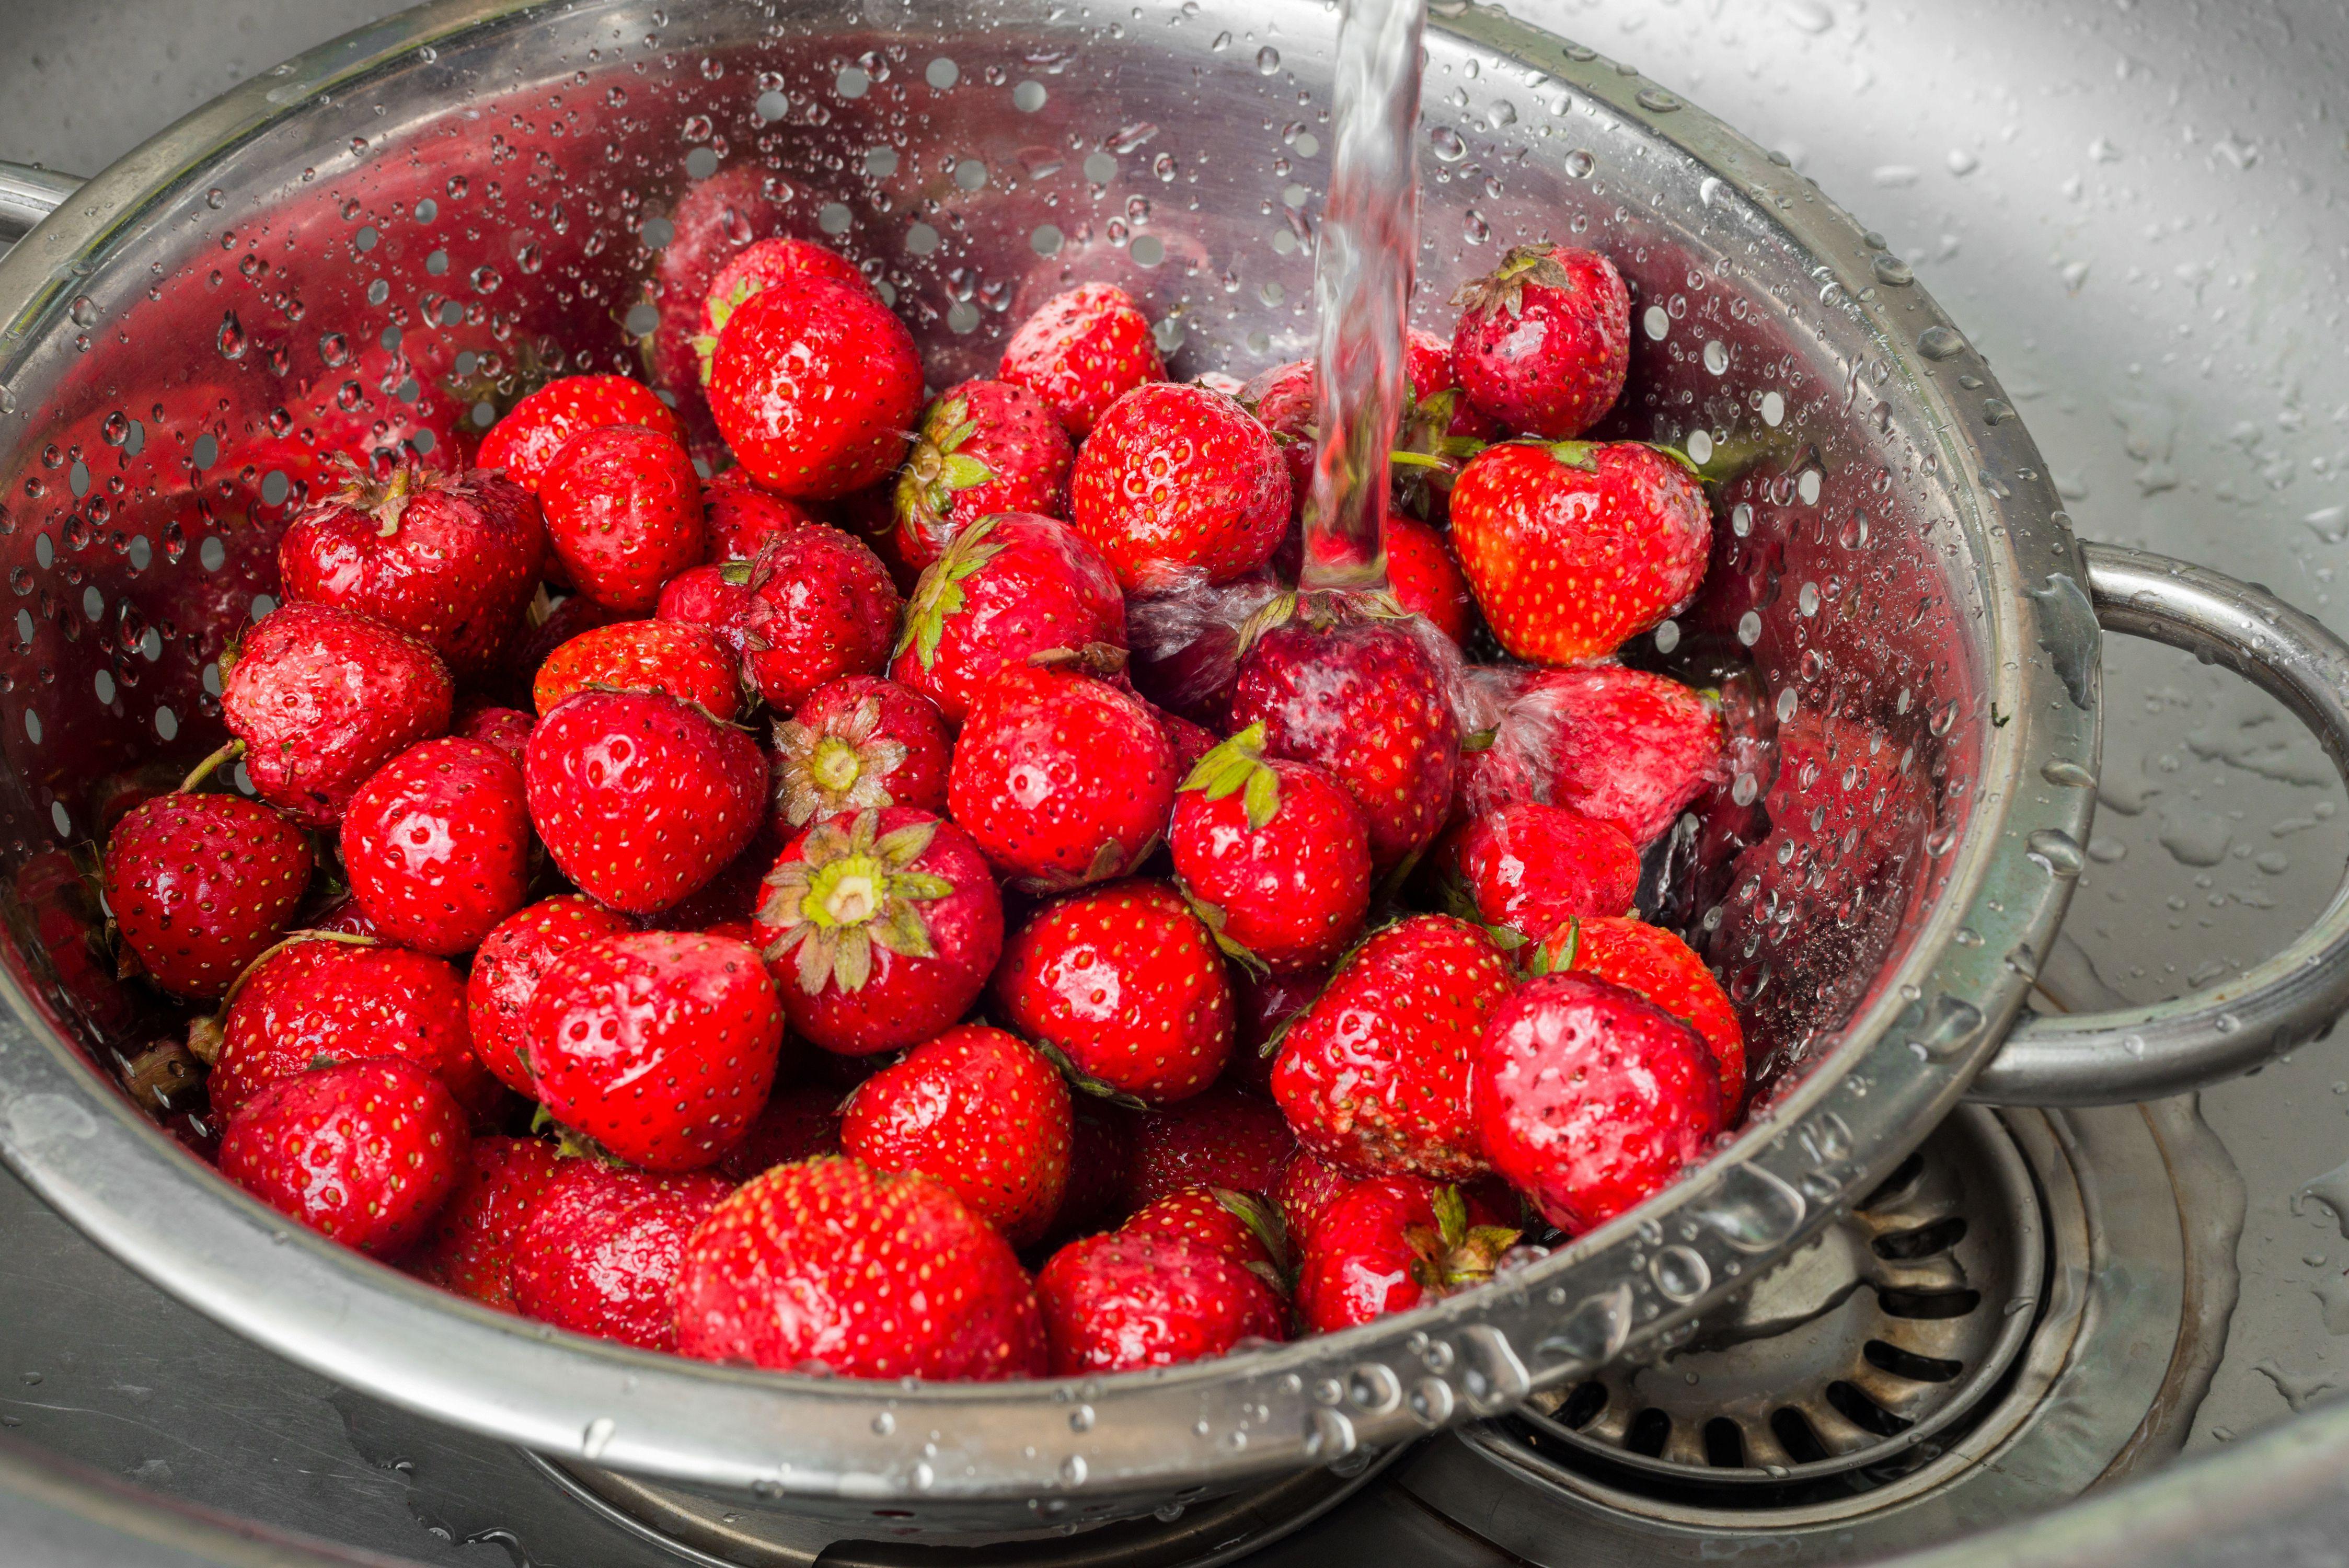 Strawberries being rinsed in a colander